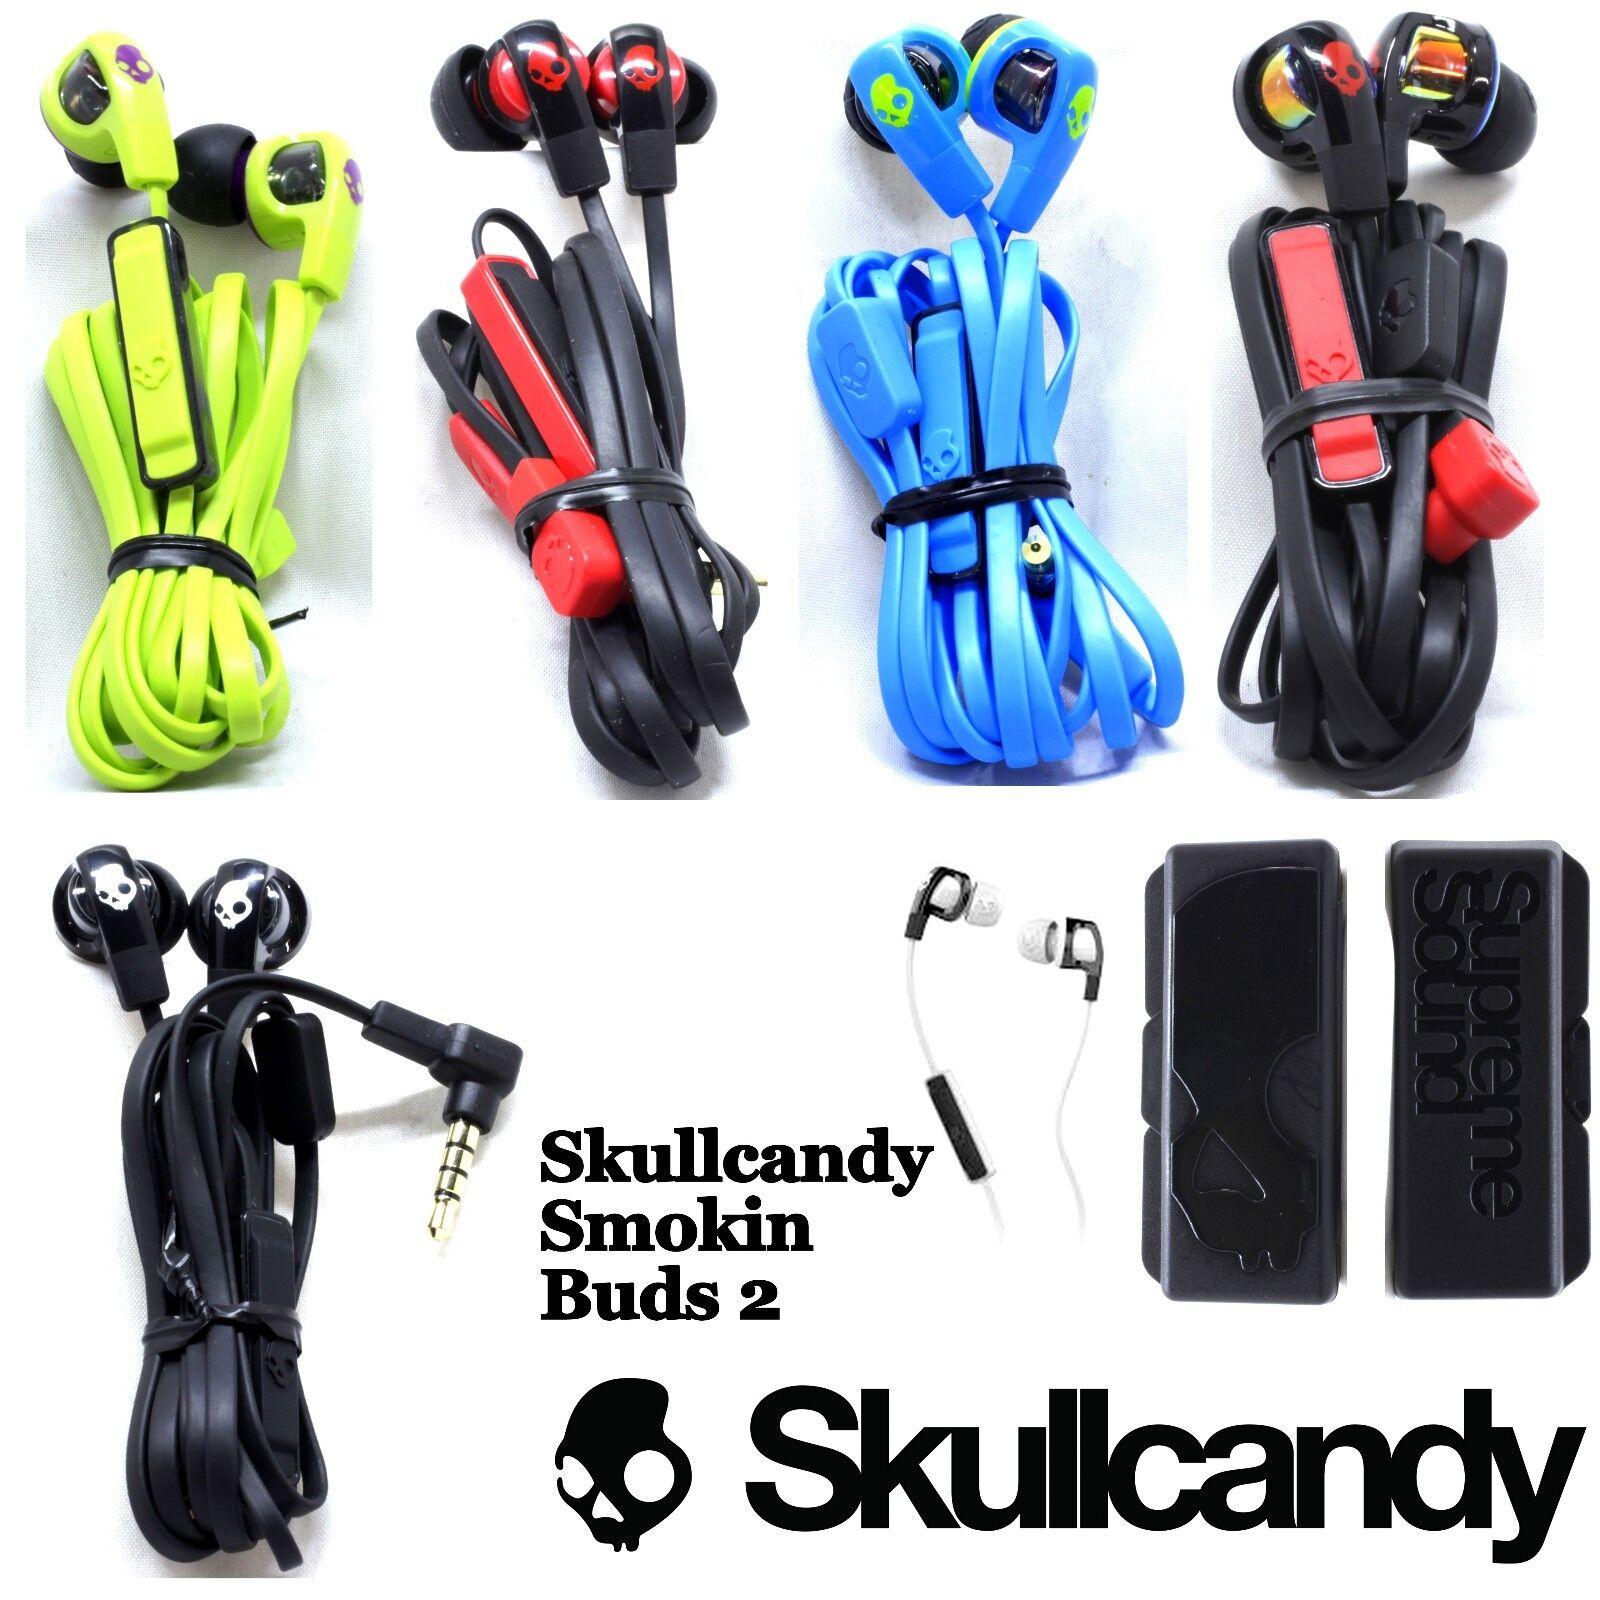 Headphones - Skullcandy SMOKIN BUDS 2 Supreme Sound Earphones Mic Blue Black Red White New